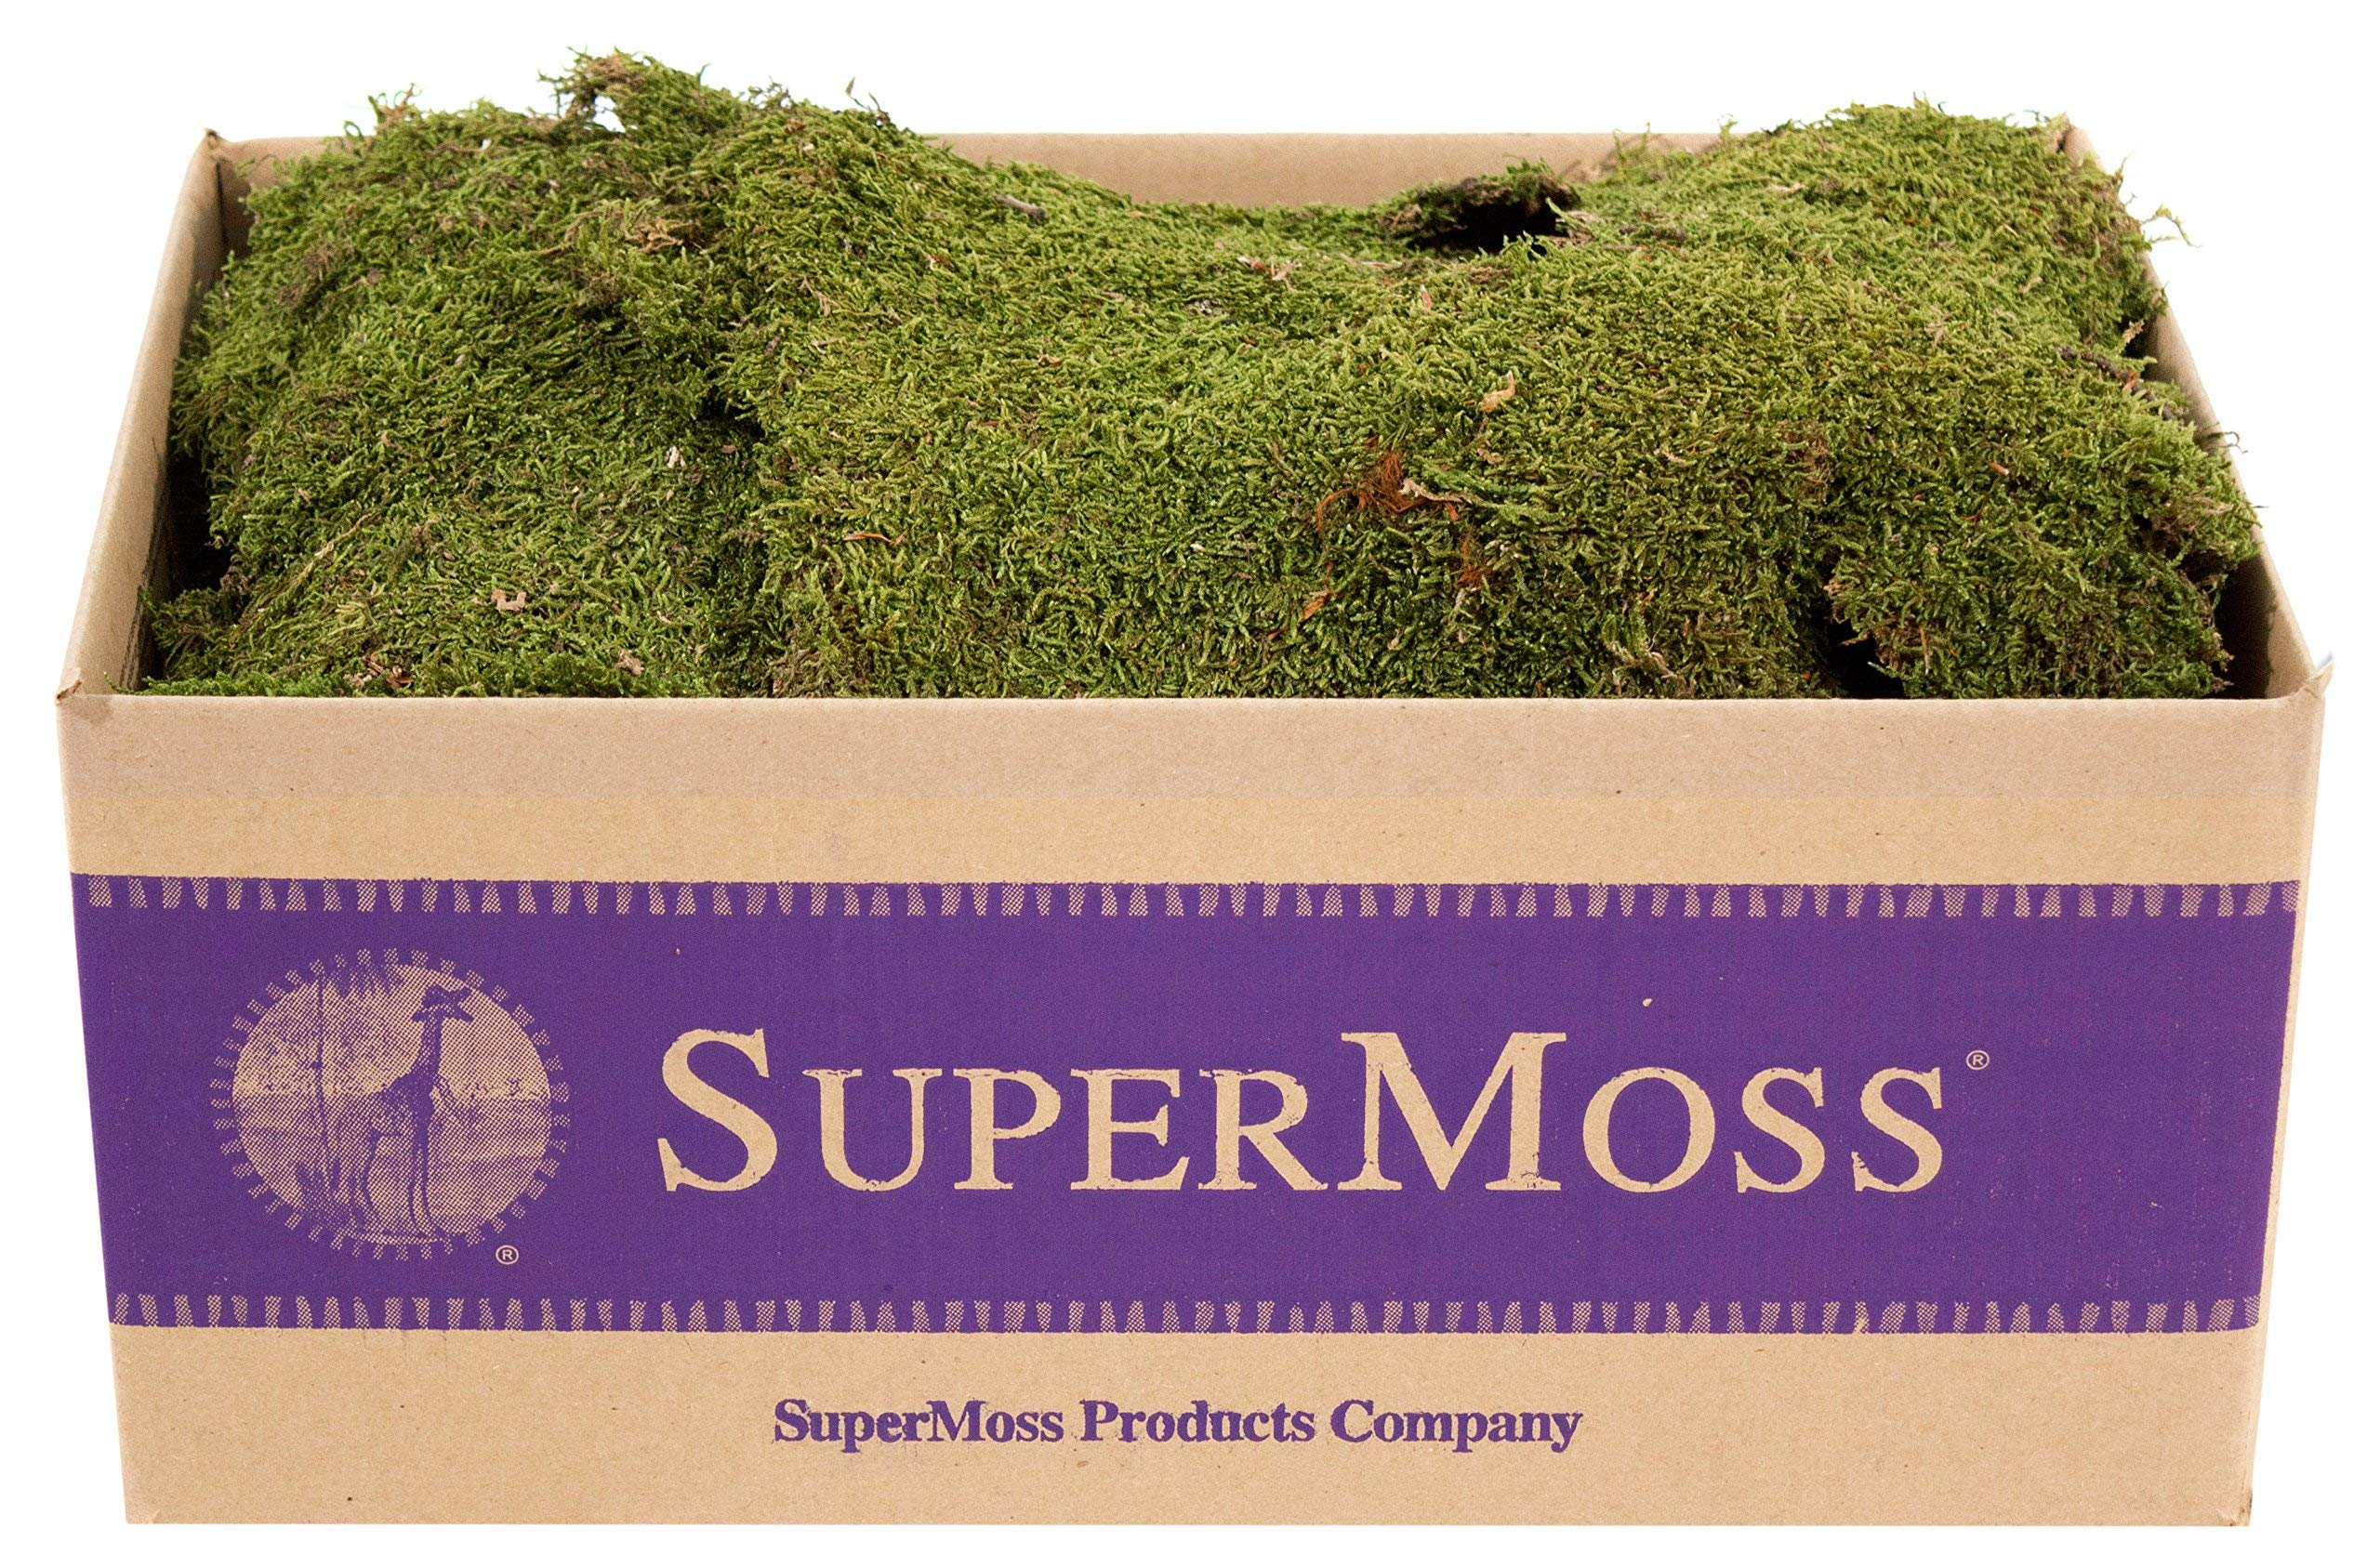 SuperMoss (21588) Sheet Moss Dried, Natural, 5lbs (20-24 sq. ft.) (Renewed) by Super Moss